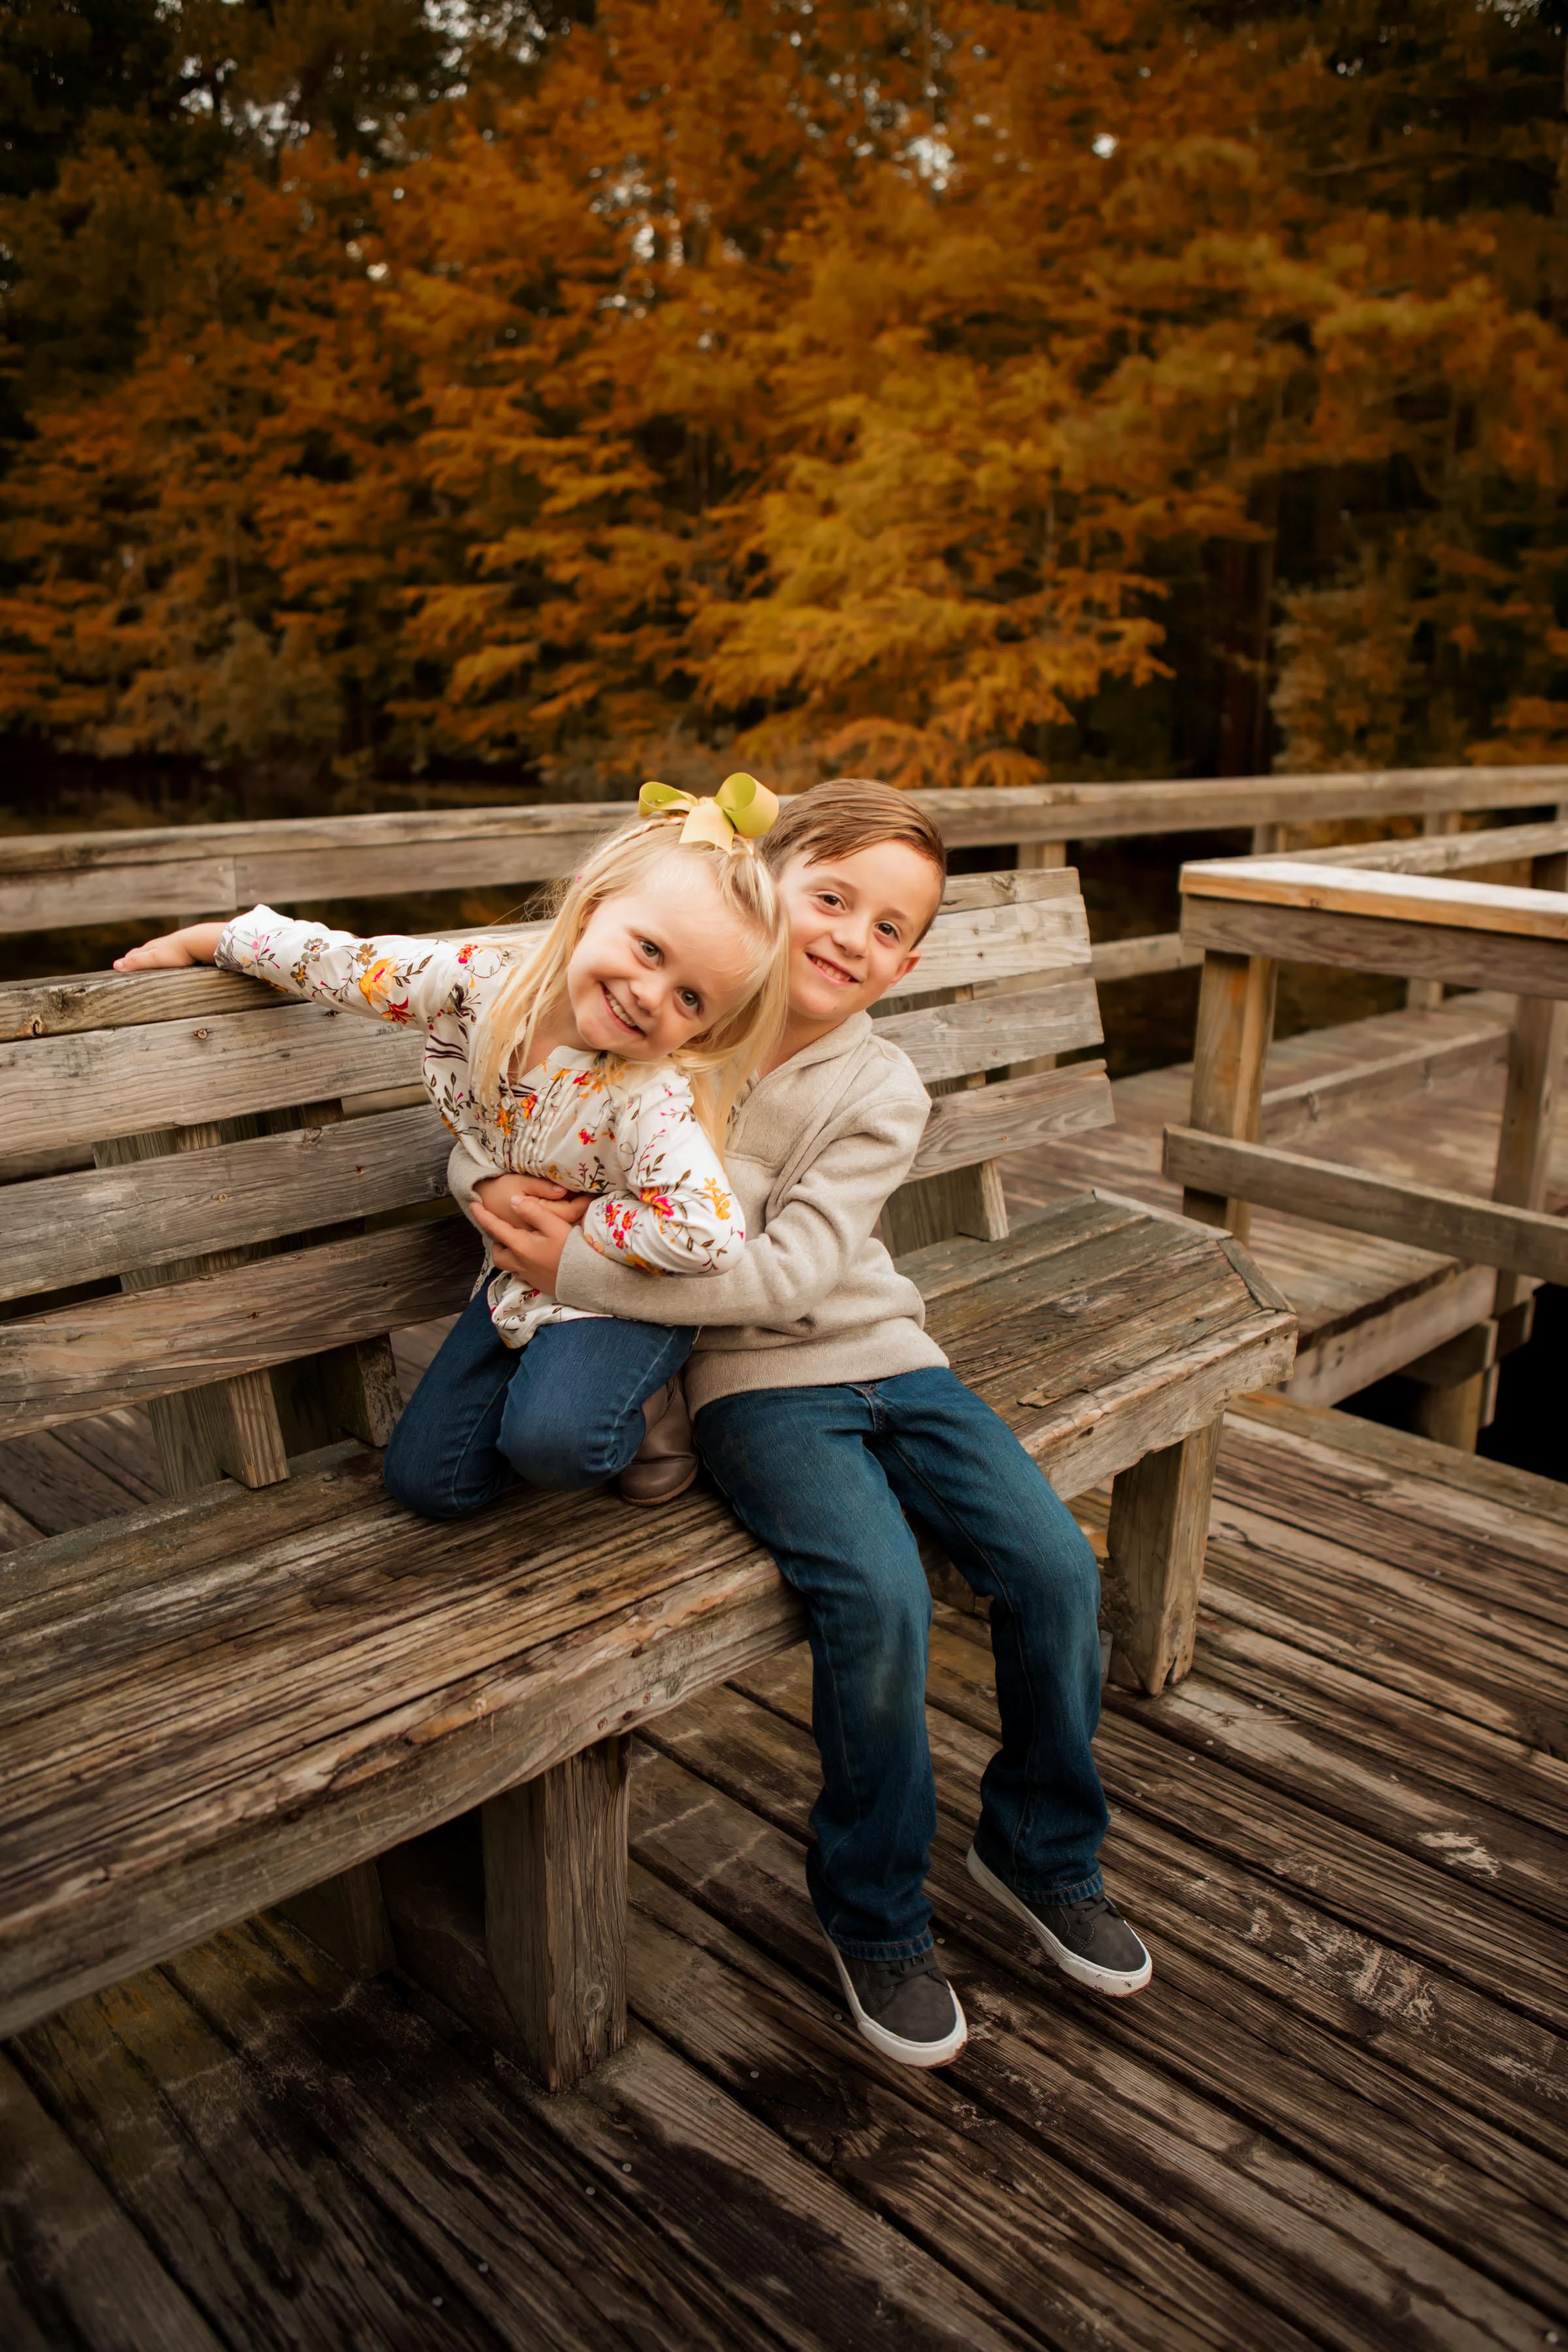 Fall-Woods-Mini-Session-Wilmington-NC-Tiffany-Abruzzo-Photography-20.jpg